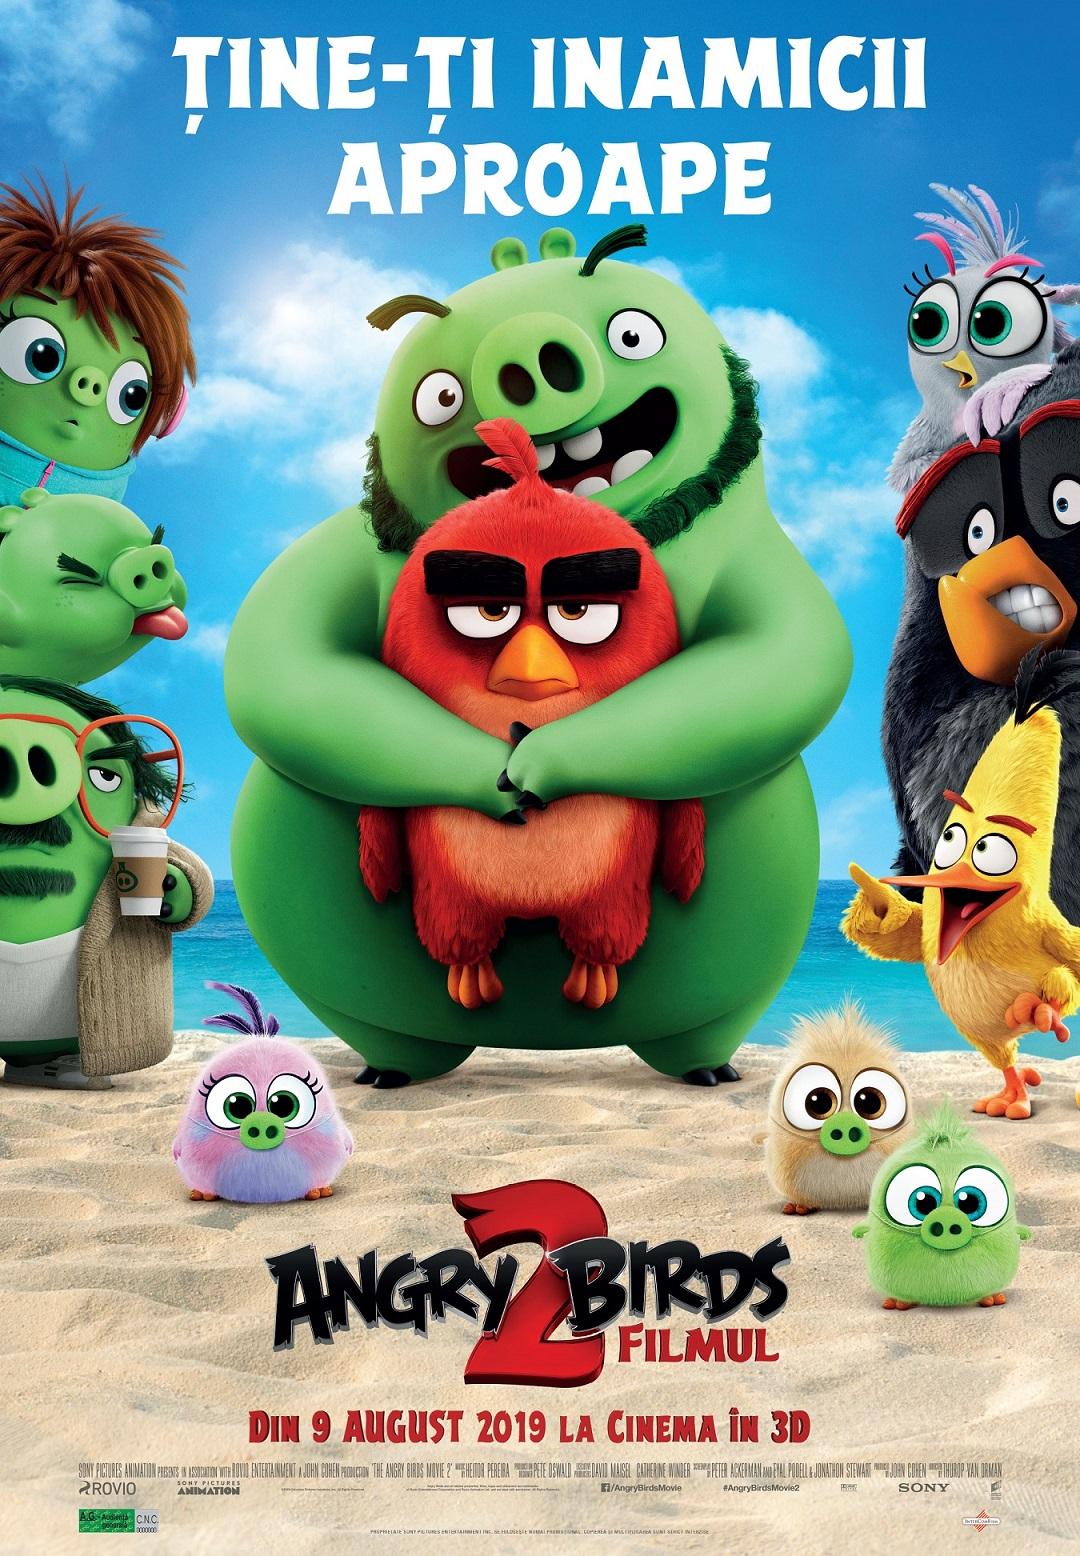 angry birds 2 - mai furioase si mai comice ca oricand! Angry Birds 2 – mai furioase si mai comice ca oricand! Angry Birds 2